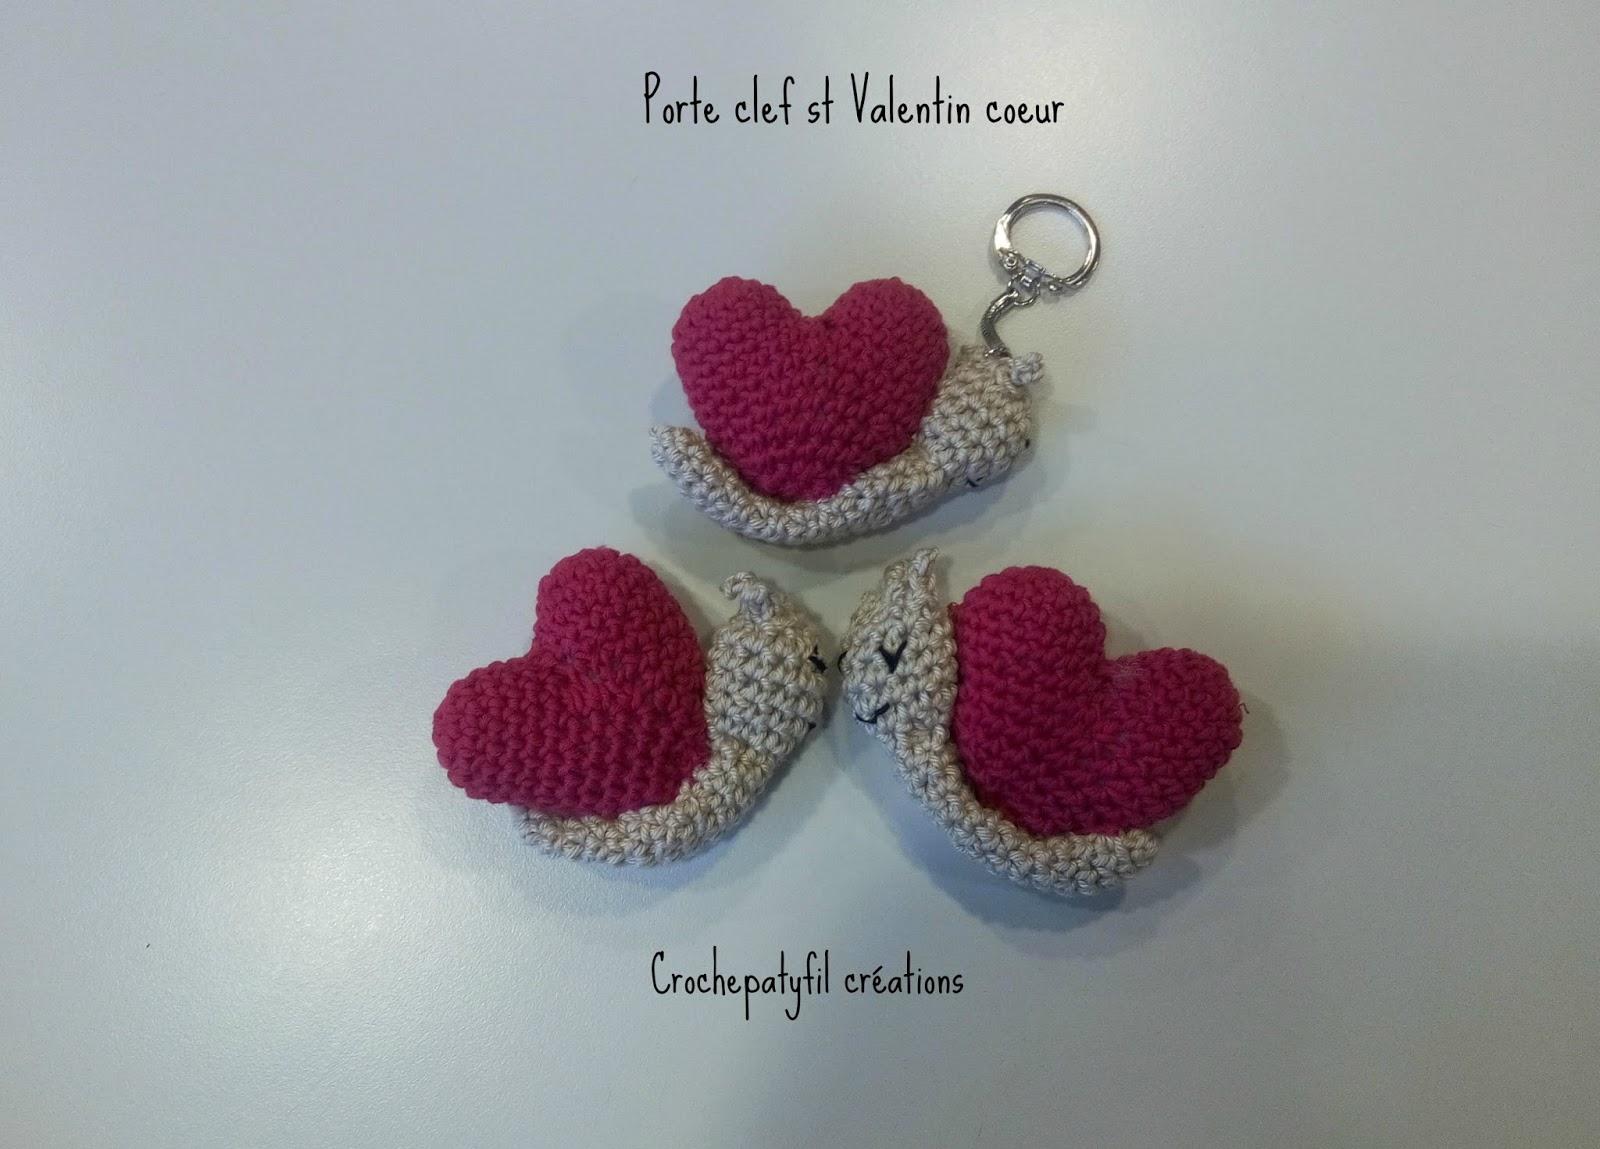 Crochepatyfil cr ations porte clef coeur escargots for Qui portent des crochets